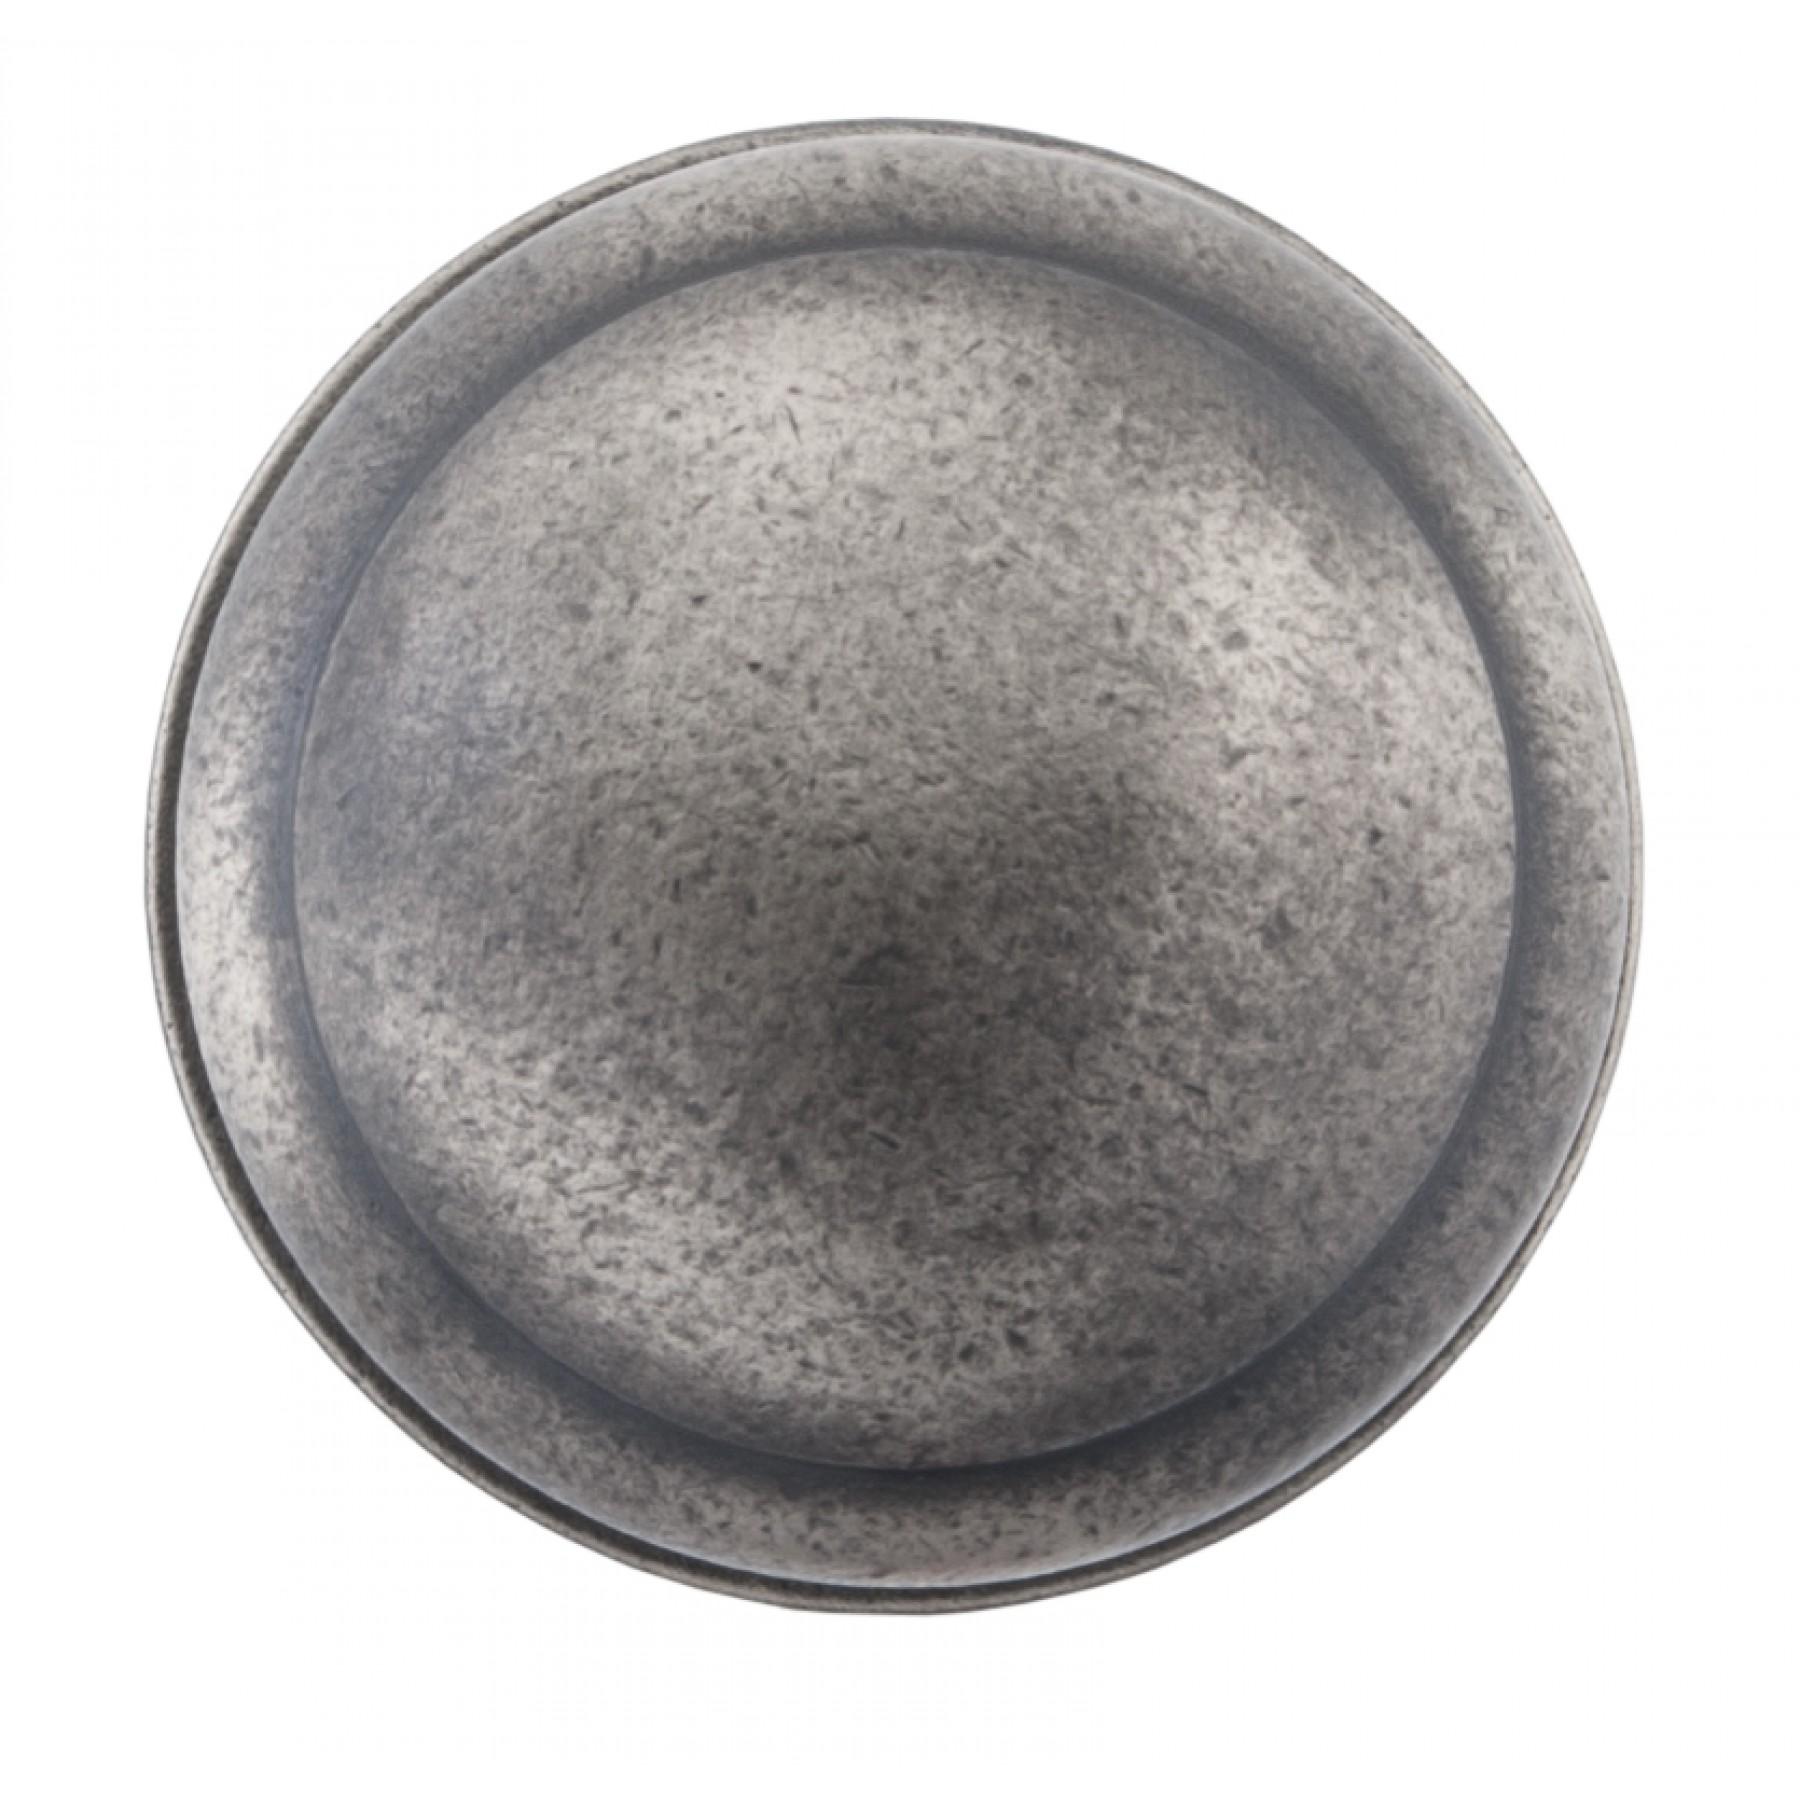 antique pewter door knobs photo - 6